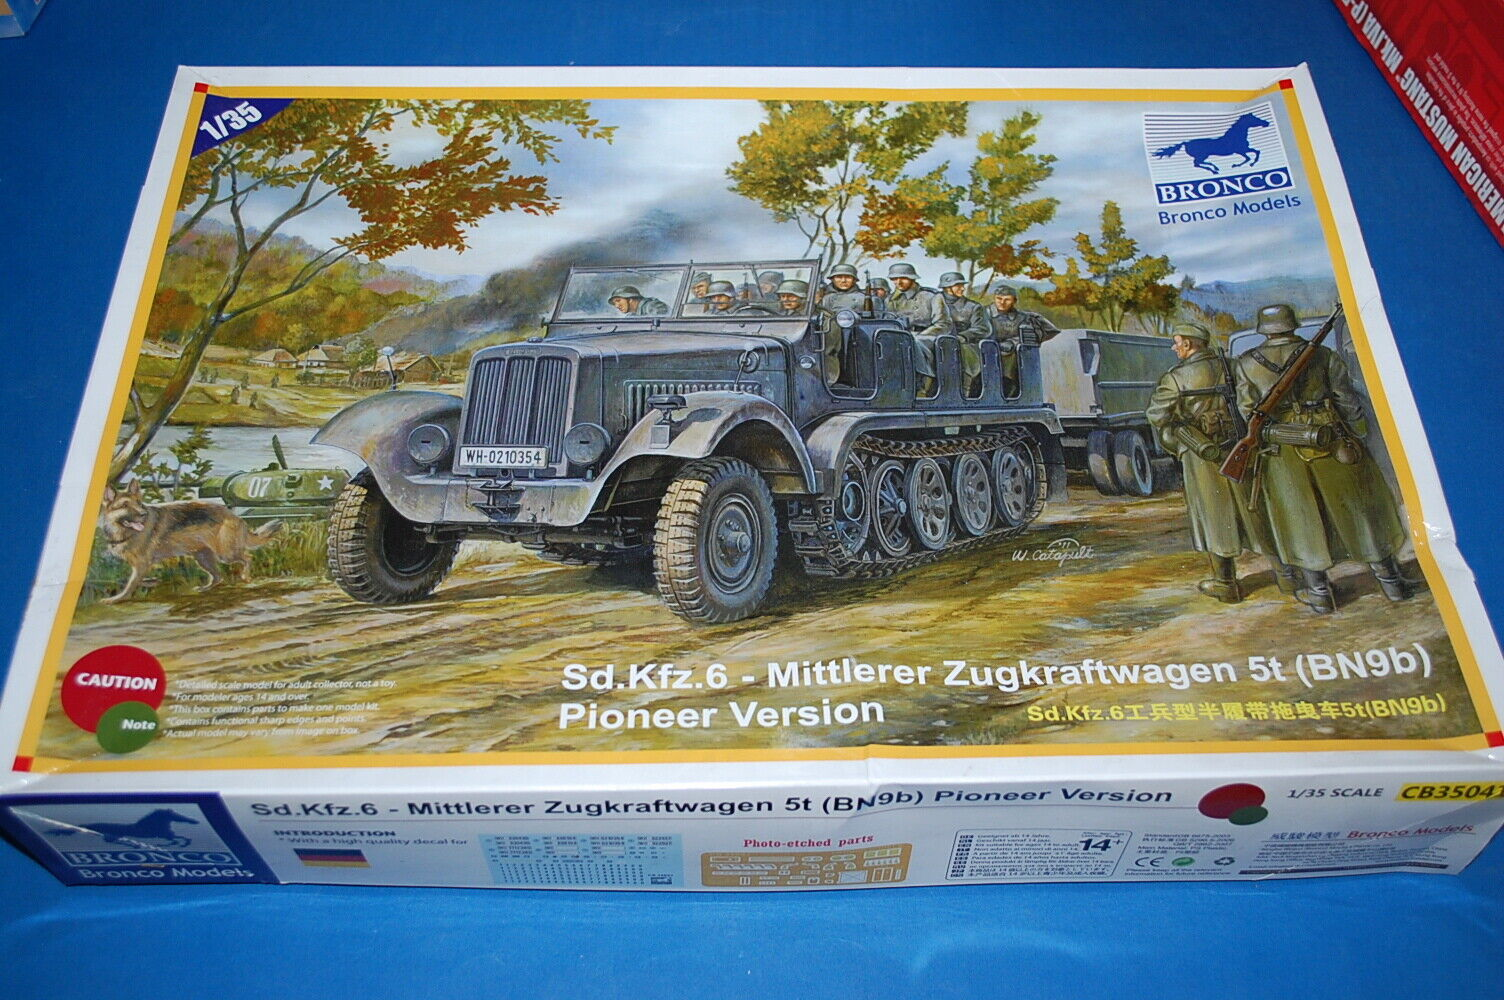 Bronco Models CB-35041 - Sd.Kfz.6 Mittlerer Zugkraftwagen 5t (BN9b)  scala 1 35